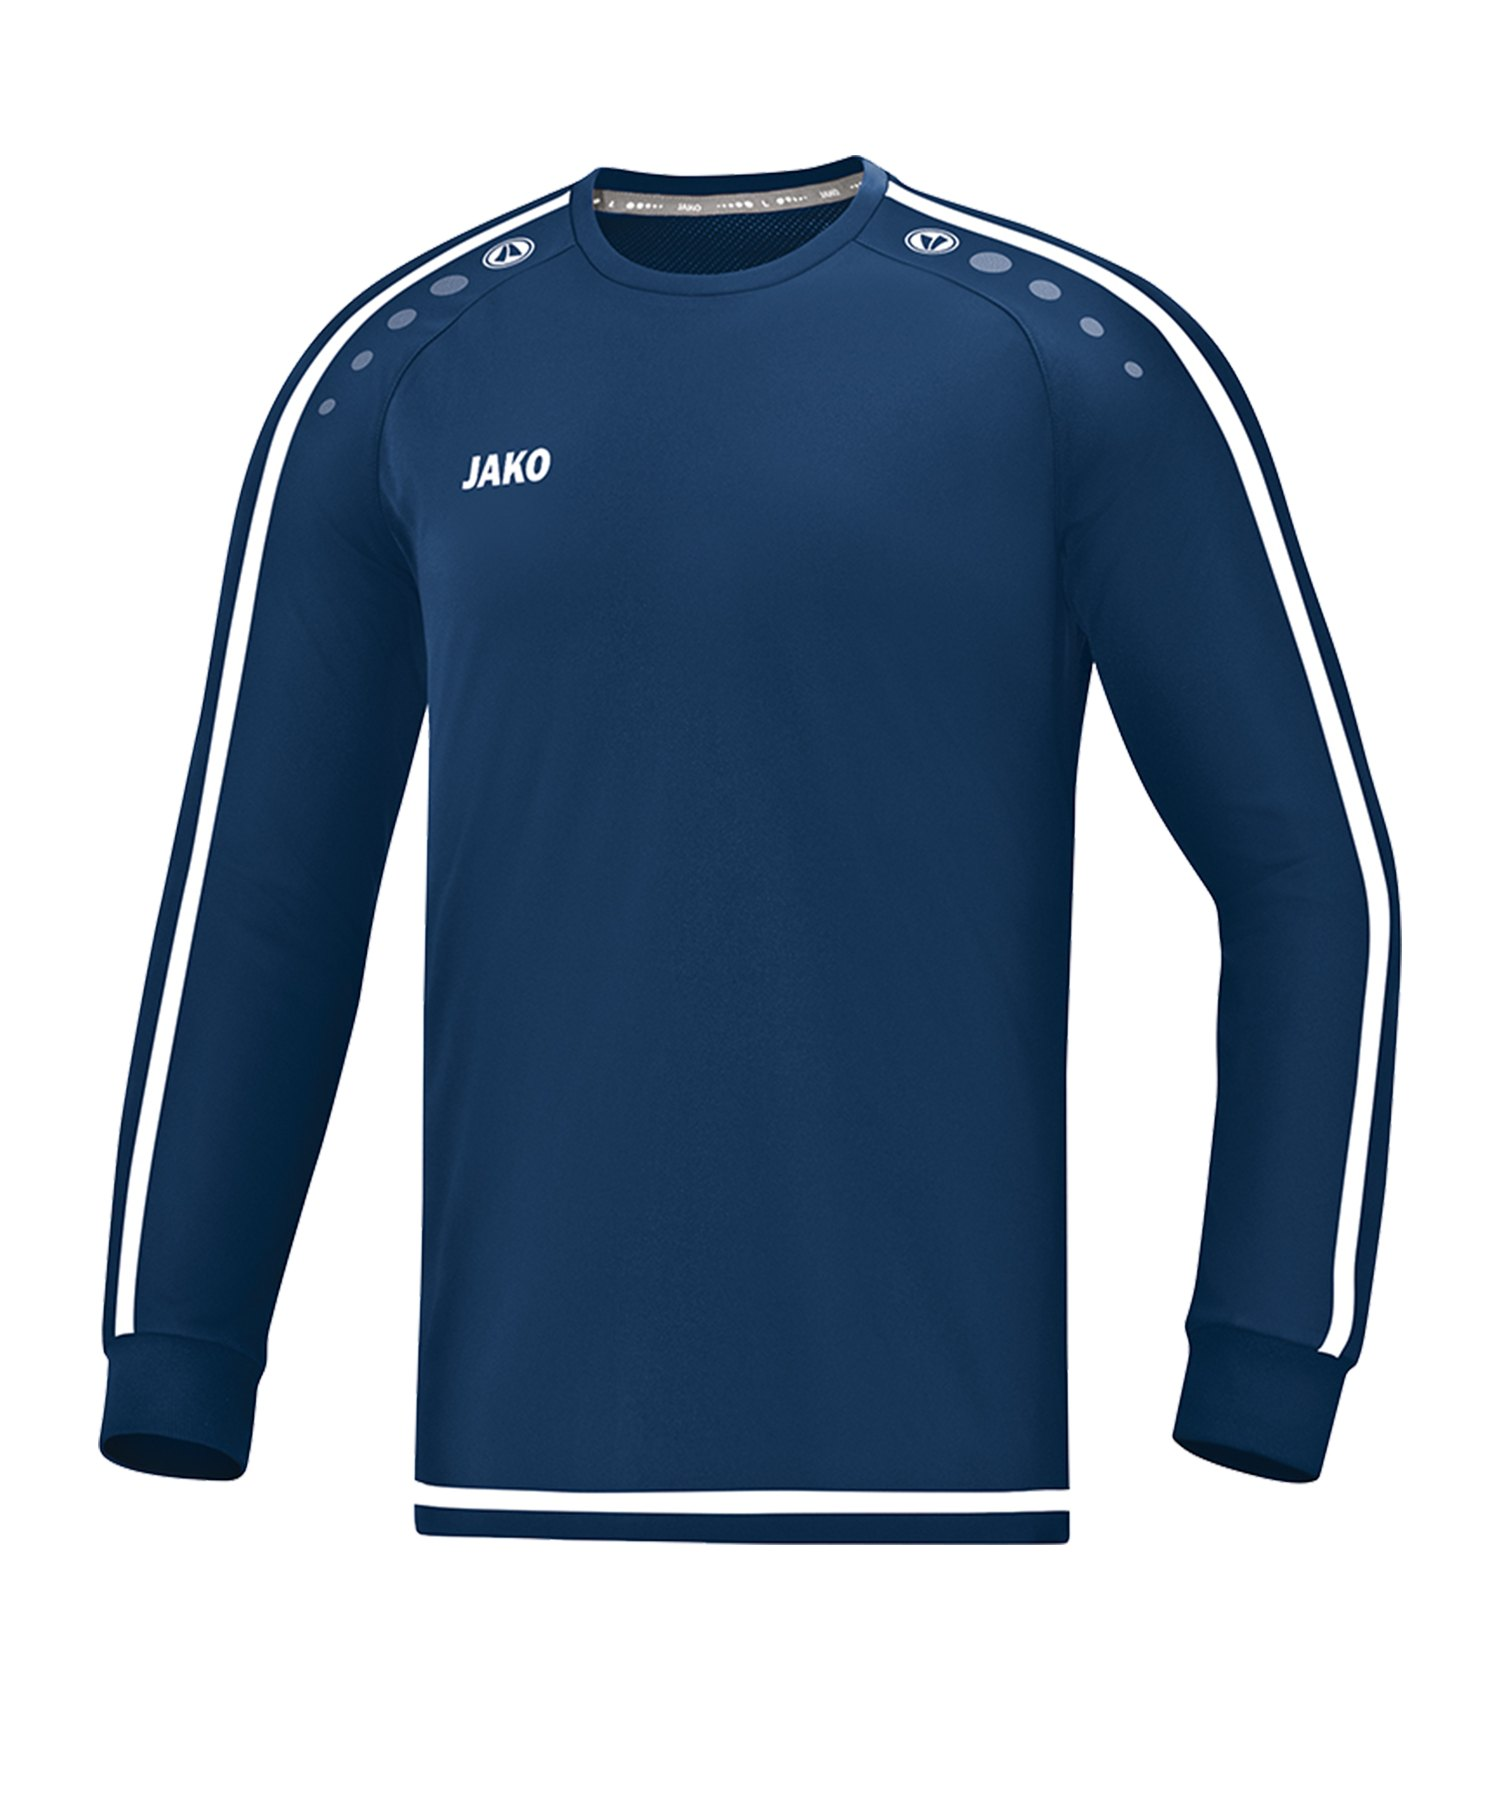 Jako Striker 2.0 Trikot langarm Kids Blau F99 - Blau